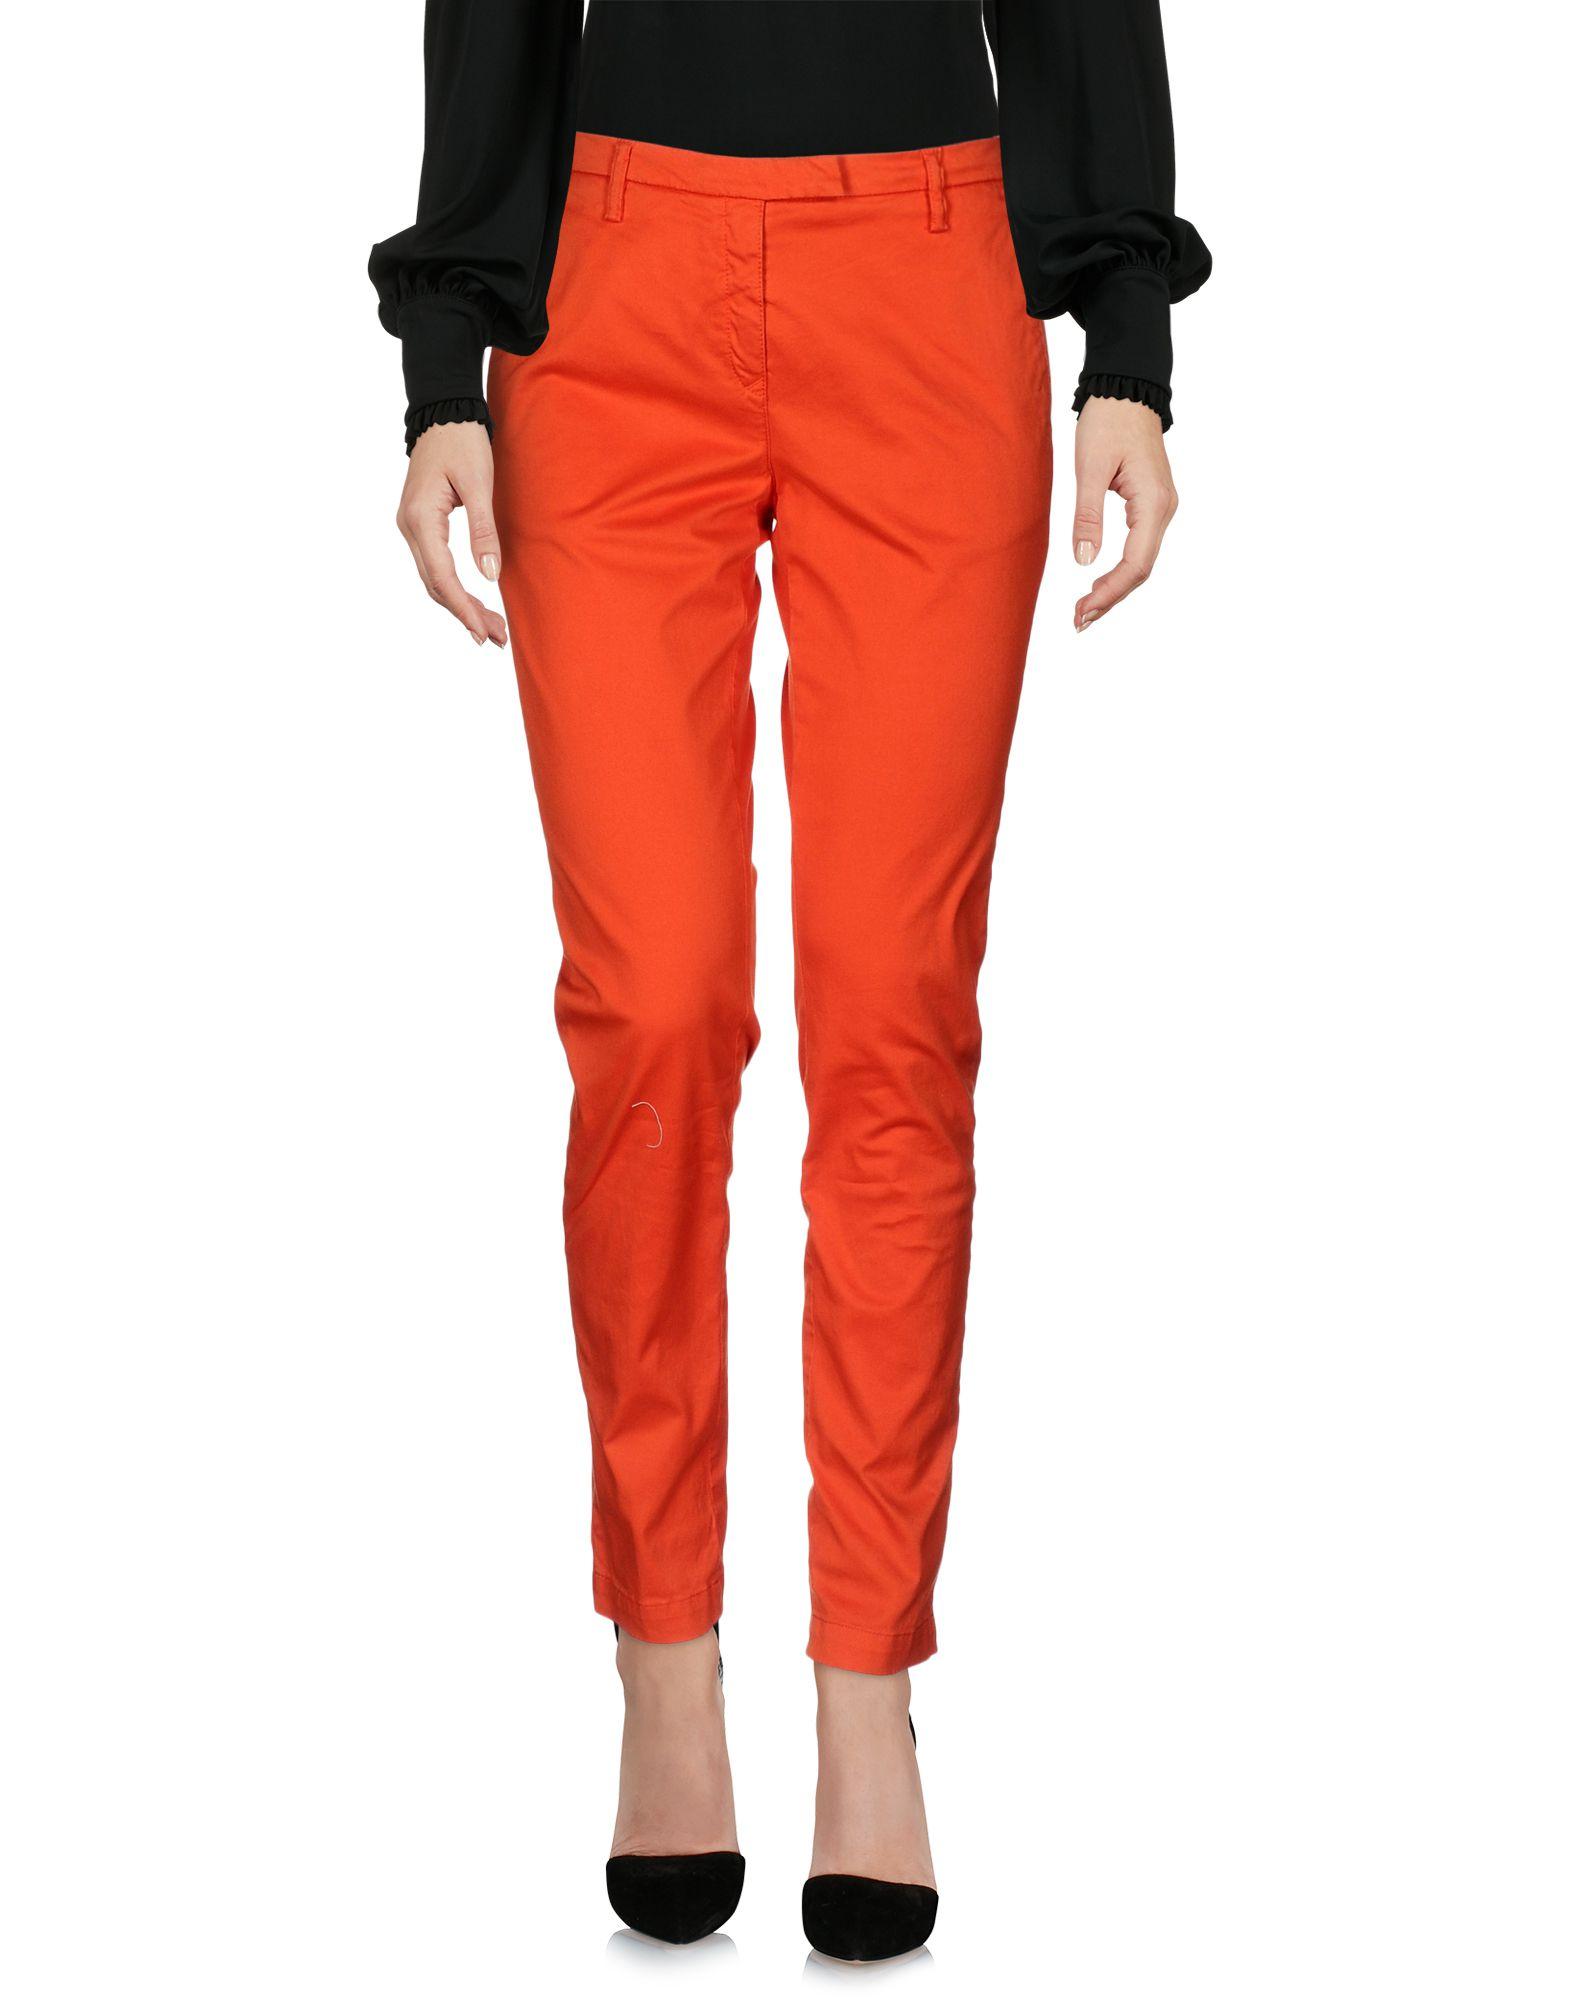 Pantalone Department 5 5 donna - 36774245HE